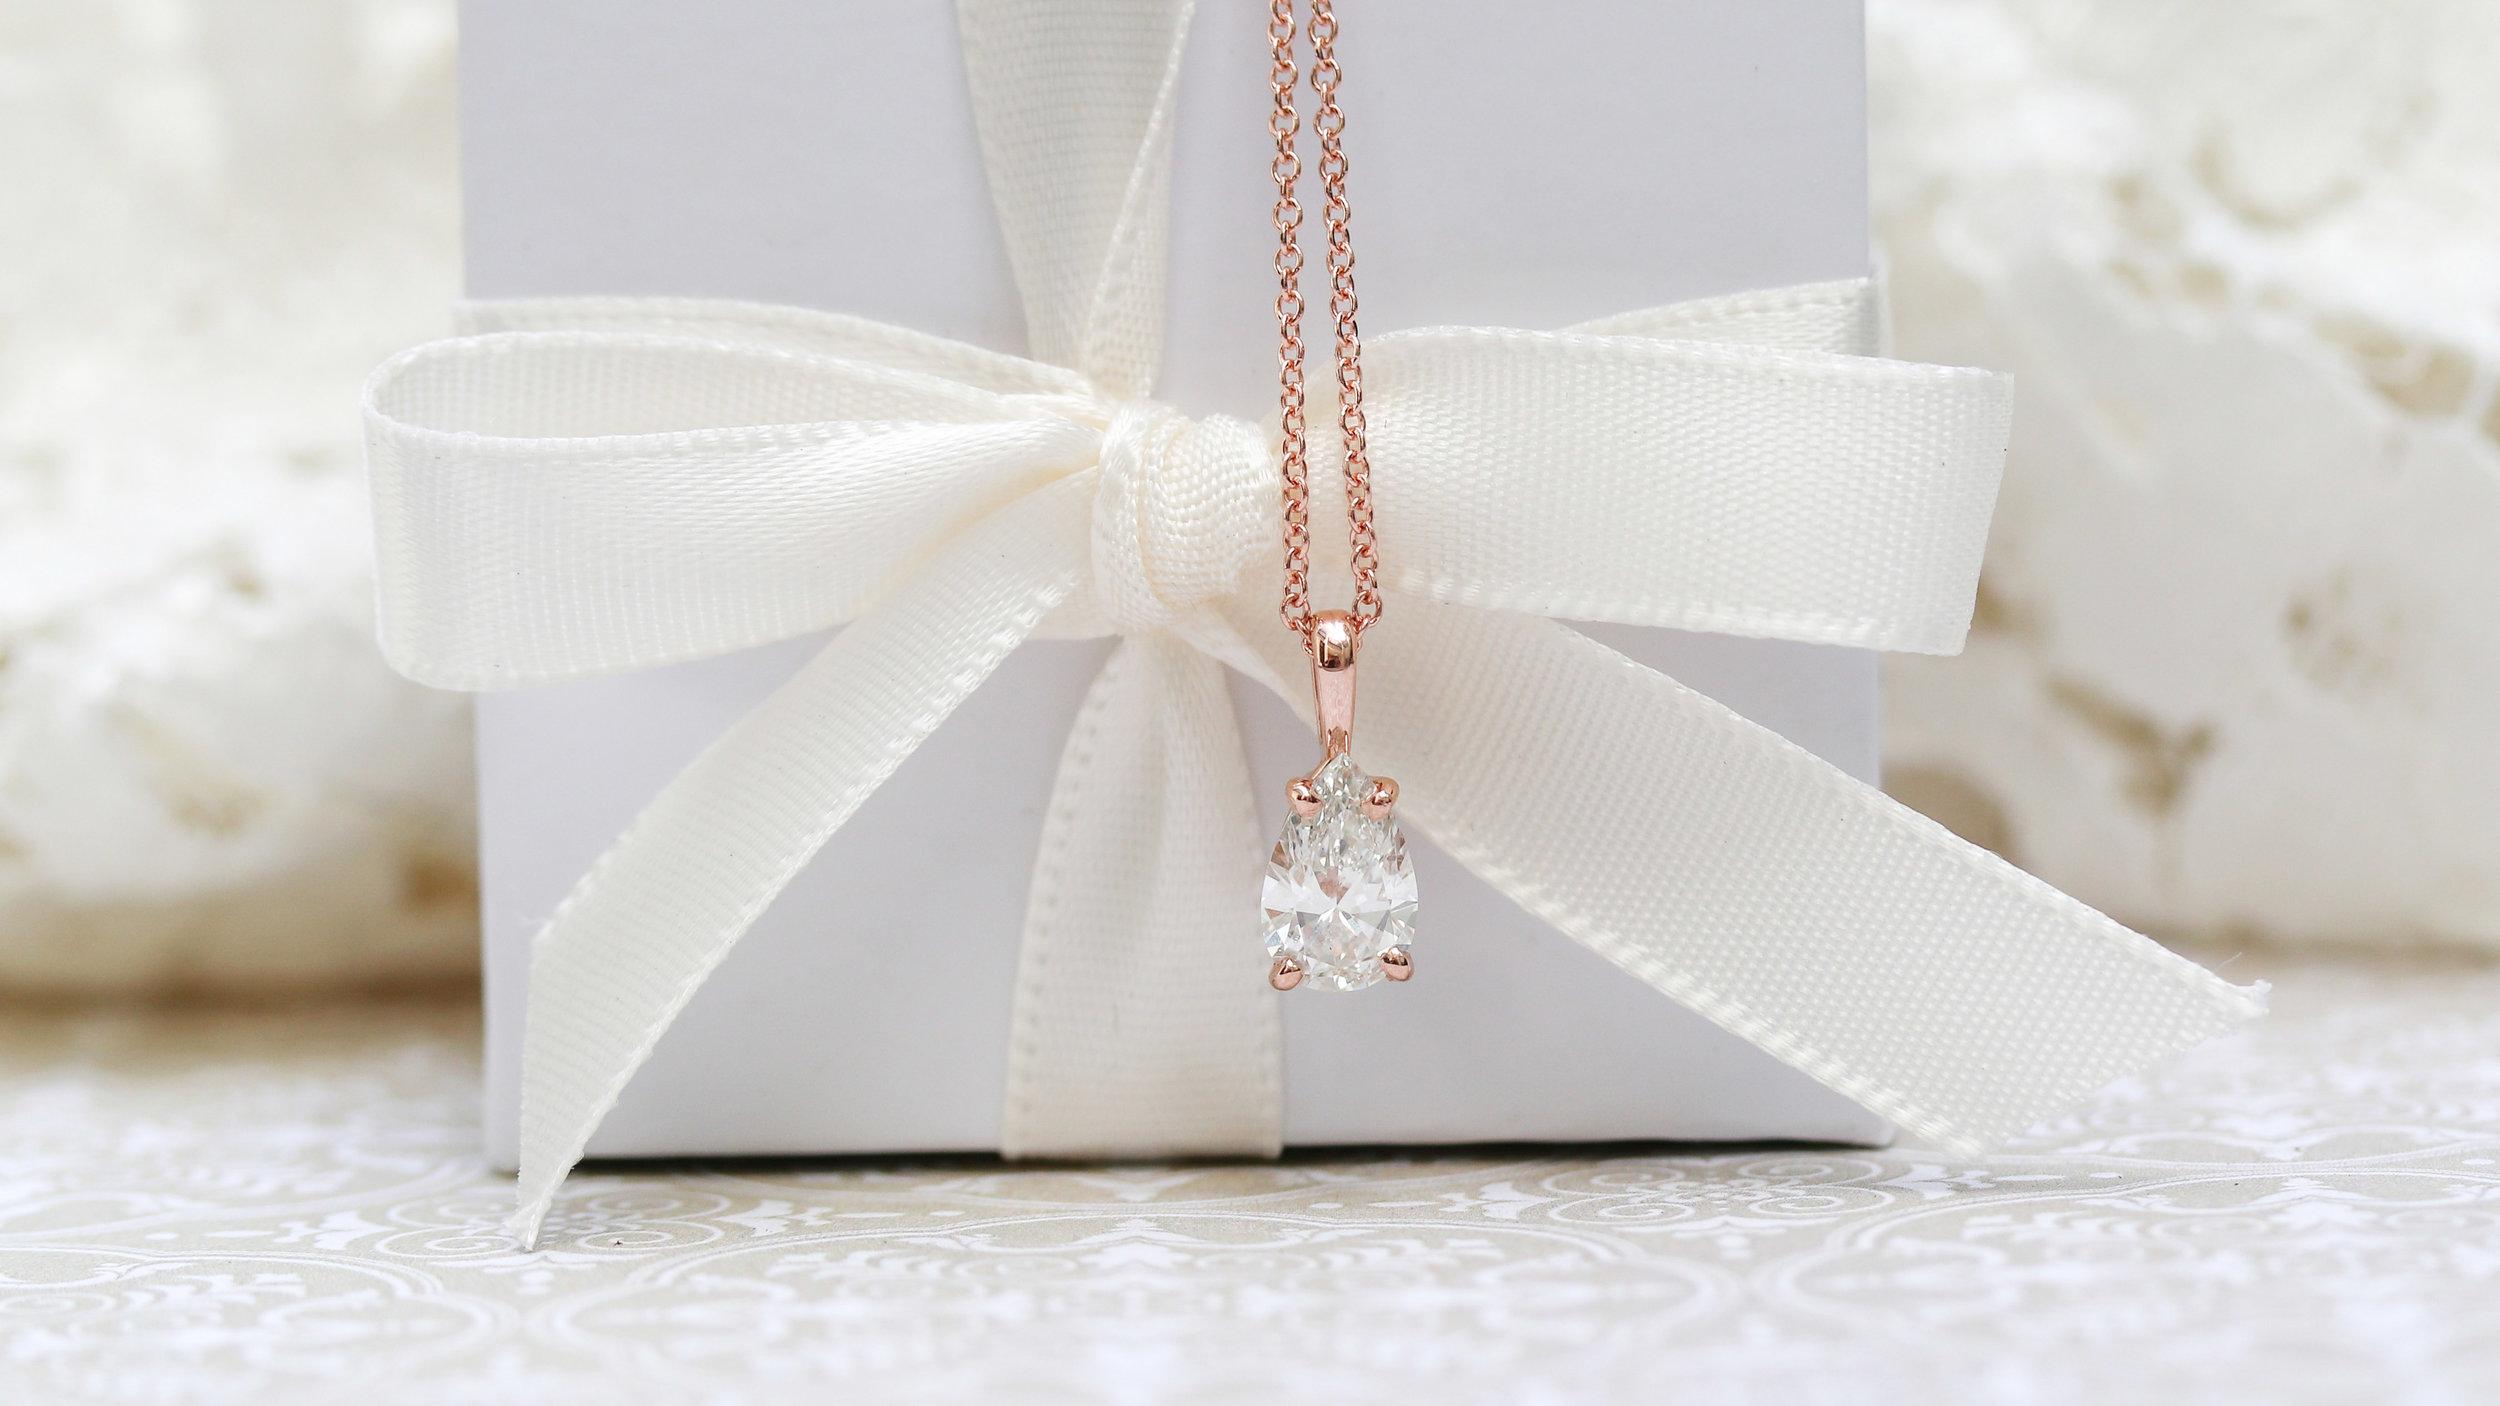 Split bale lab diamond solitaire pendant necklace in rose gold